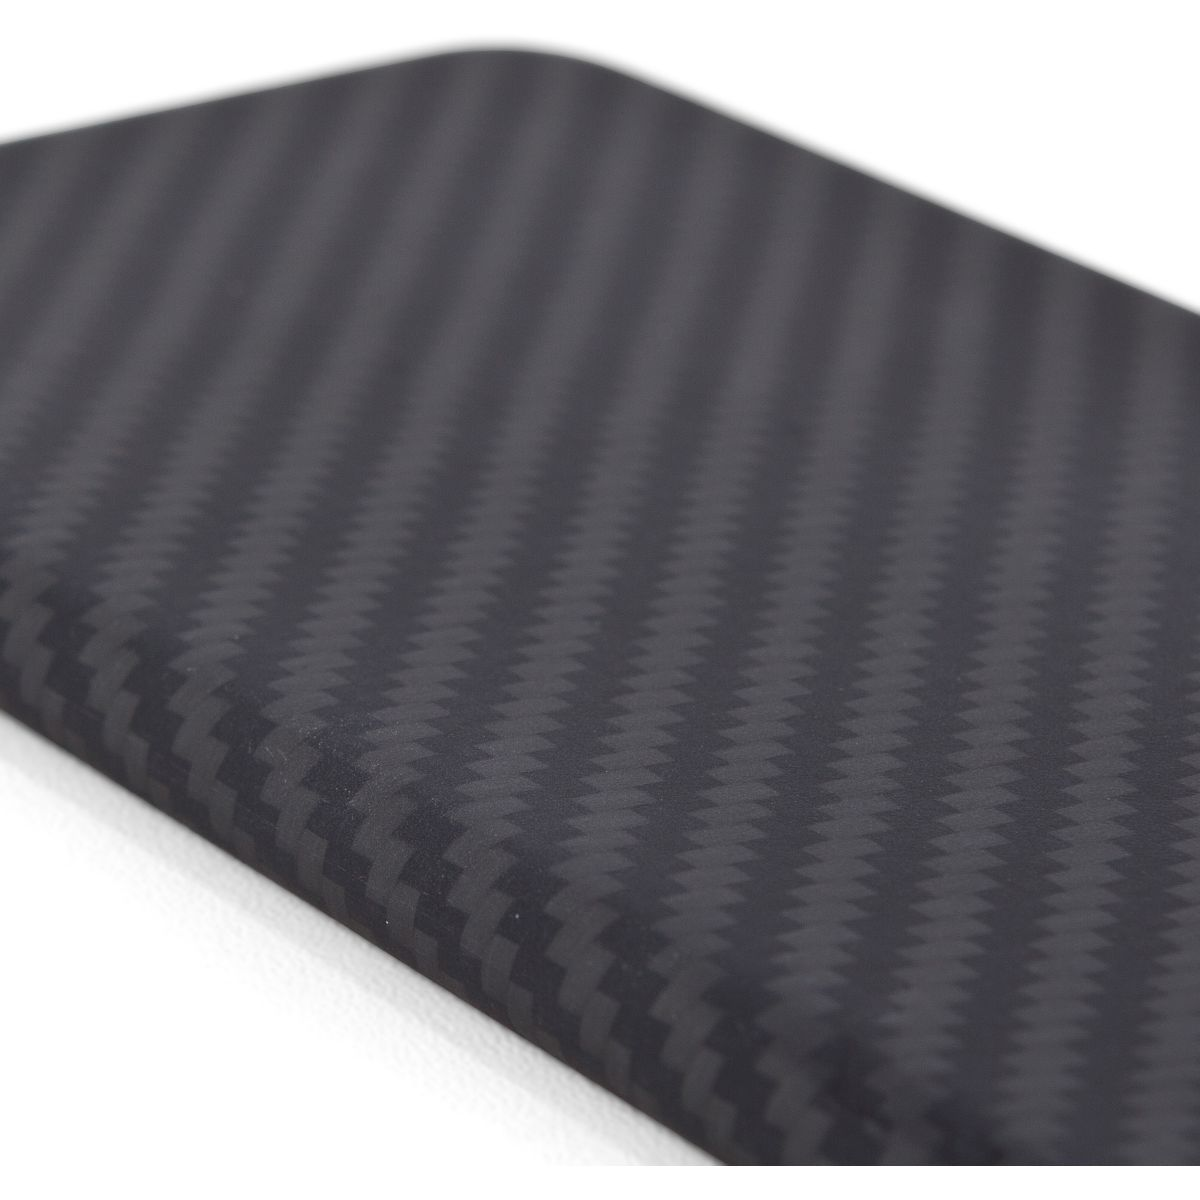 Coque ADEQWAT S8 rigide ultra résistante (photo)